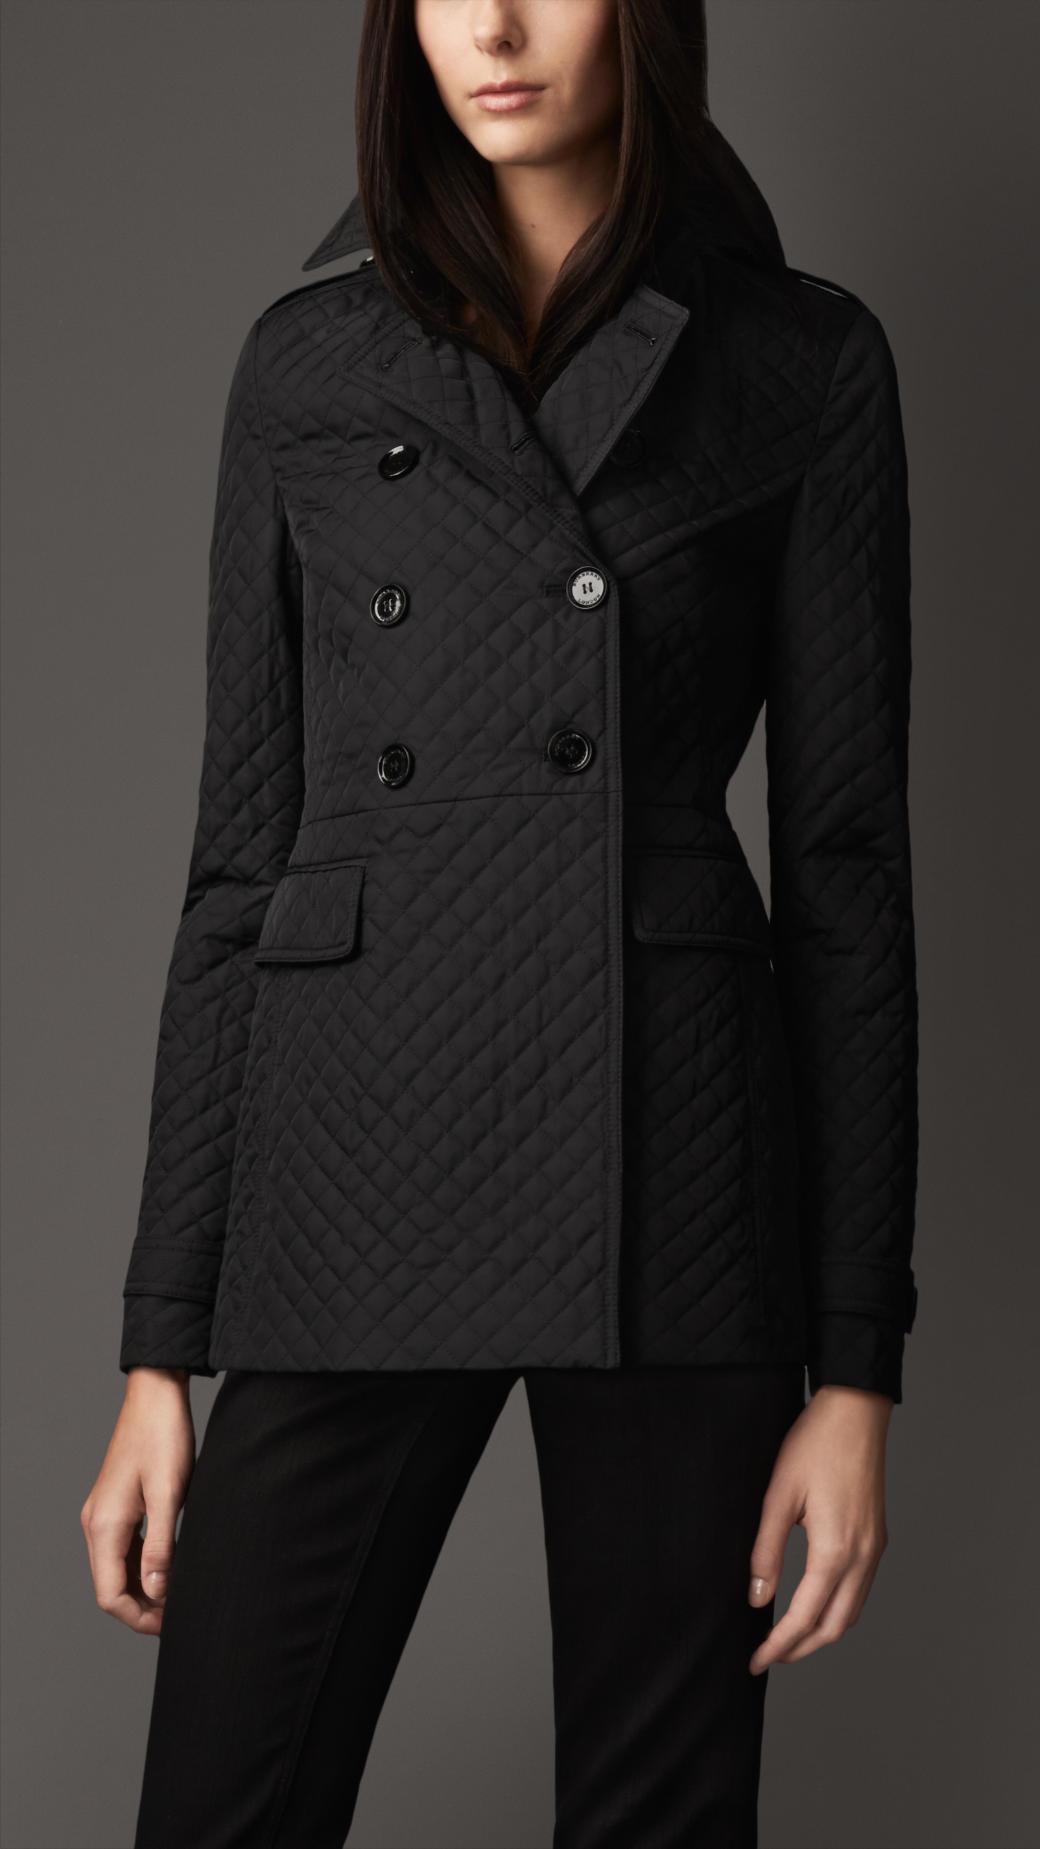 Burberry Slim Fit Quilted Pea Coat in Black | Lyst : quilted pea coat - Adamdwight.com